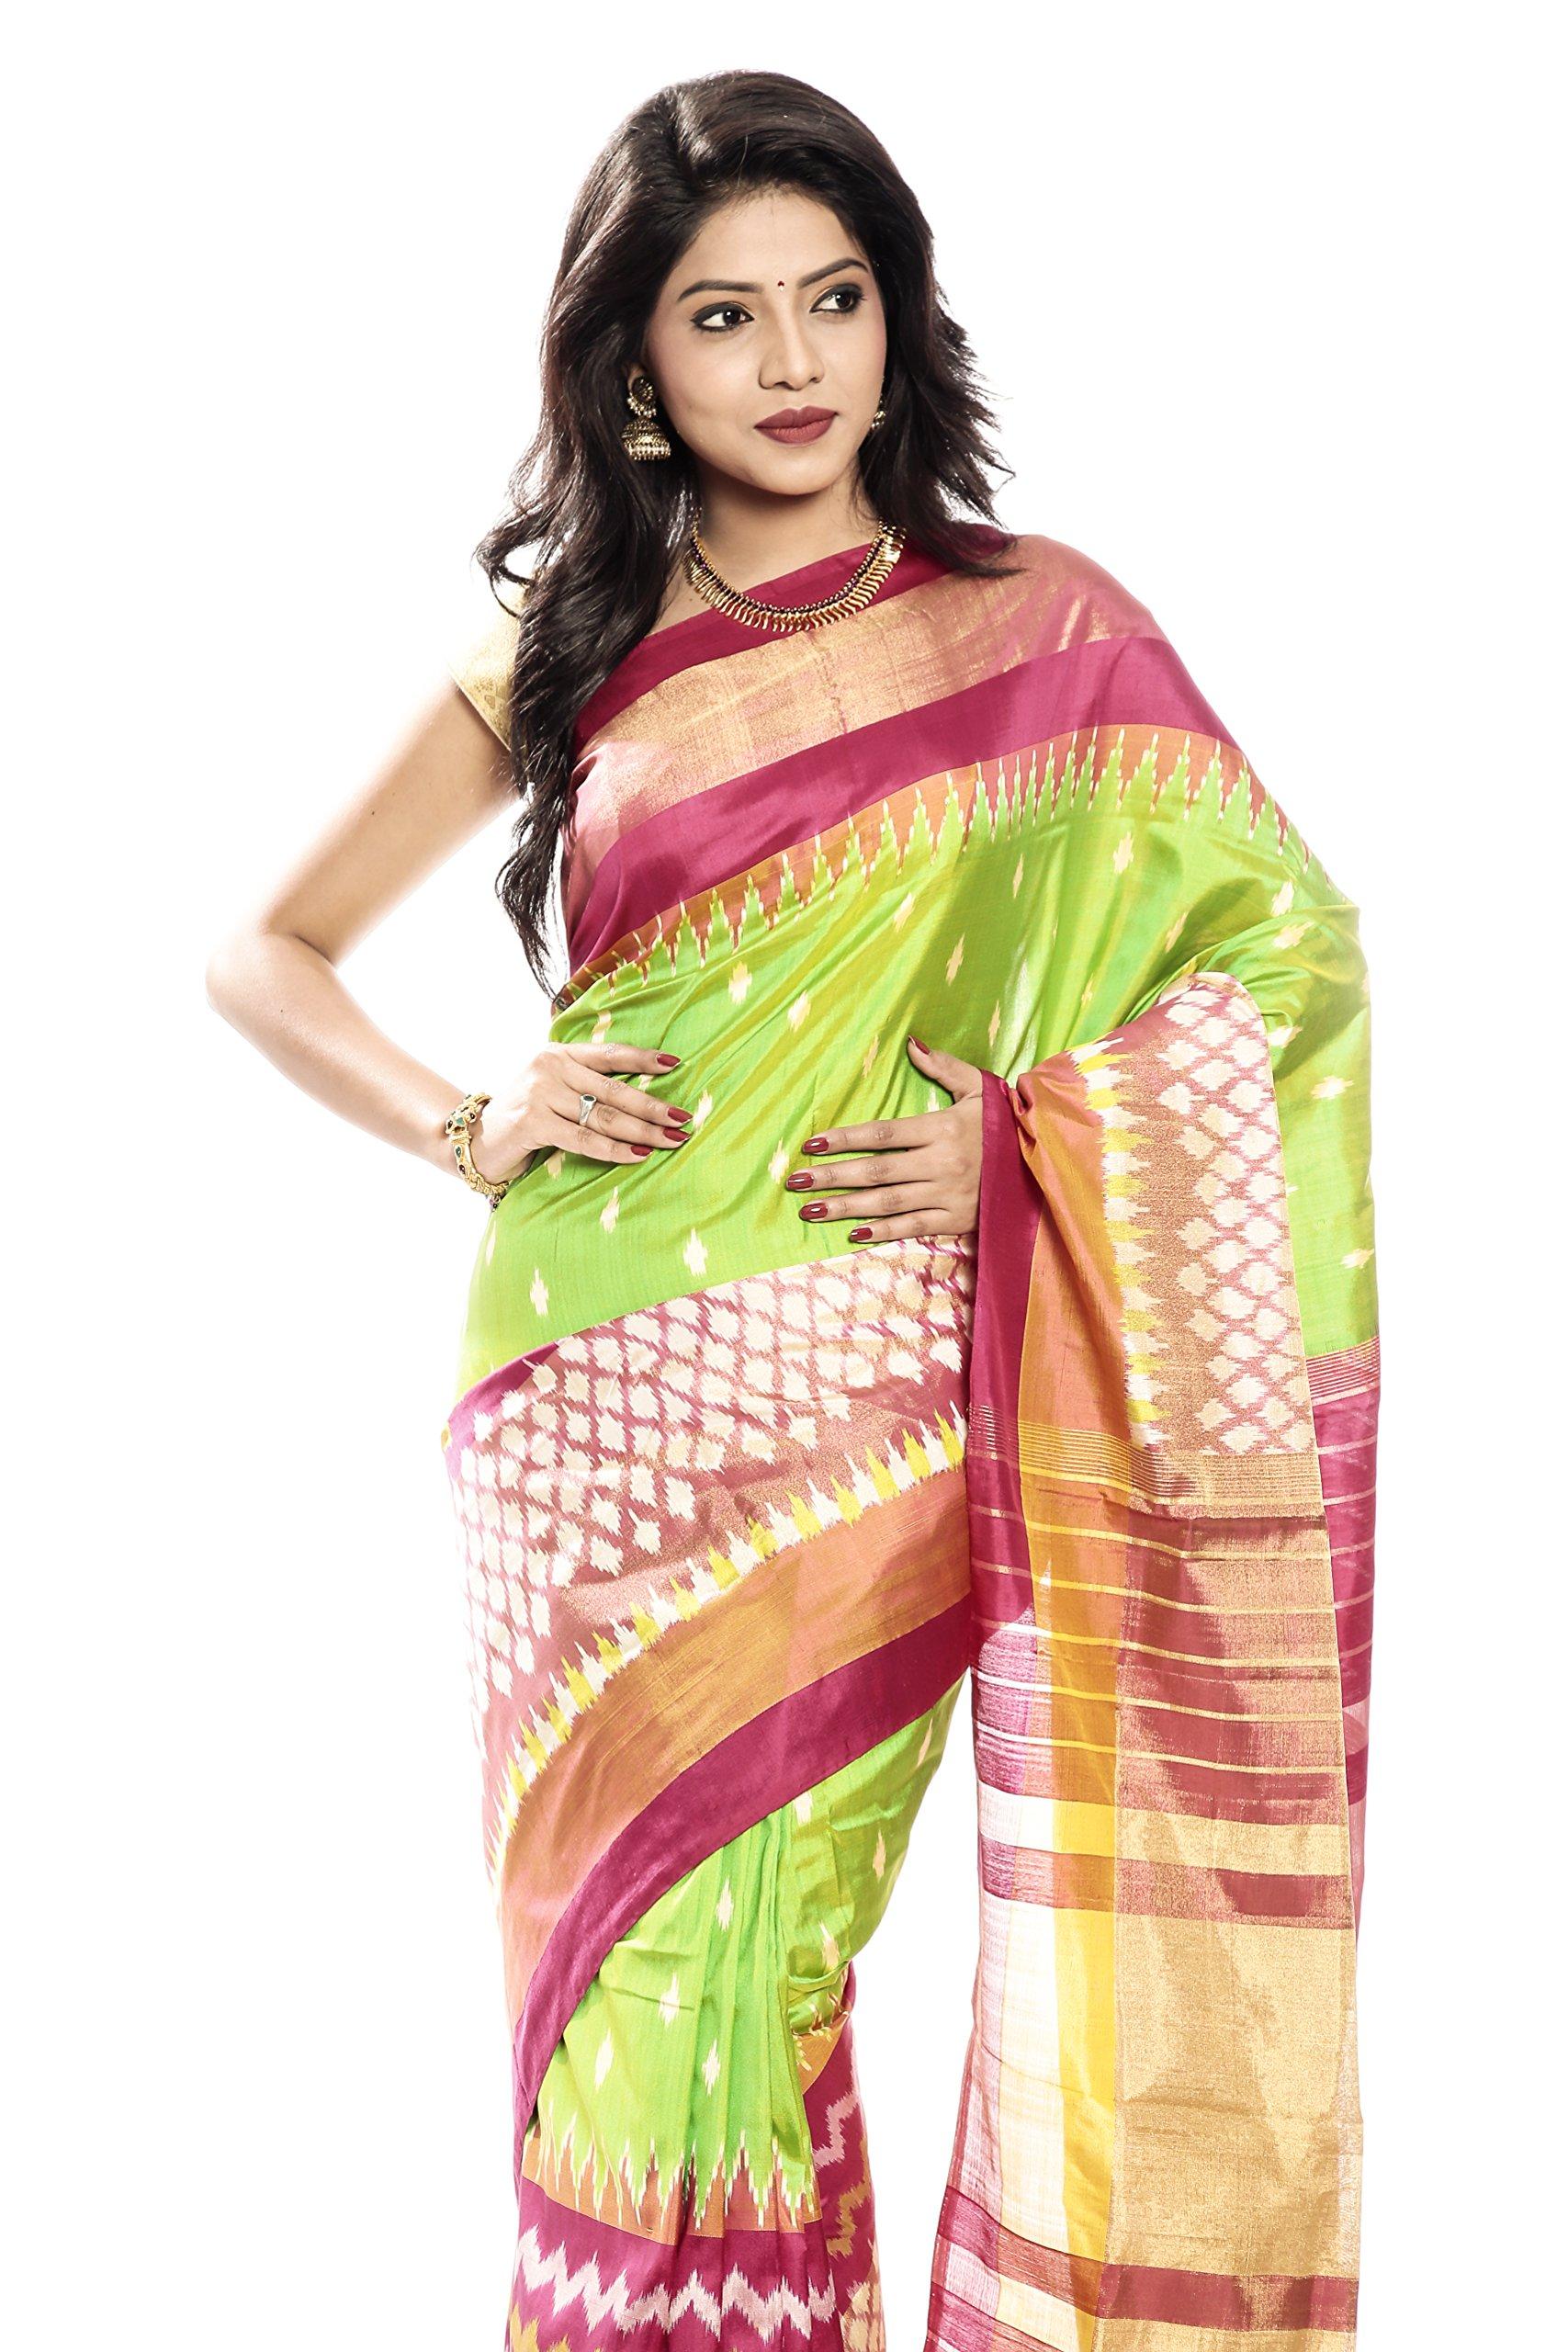 Mandakini — Indian Women's Pochampally - Handloom - Ikat Pure Silk Saree (Pink-Green ) (MK303) by Mandakini (Image #2)